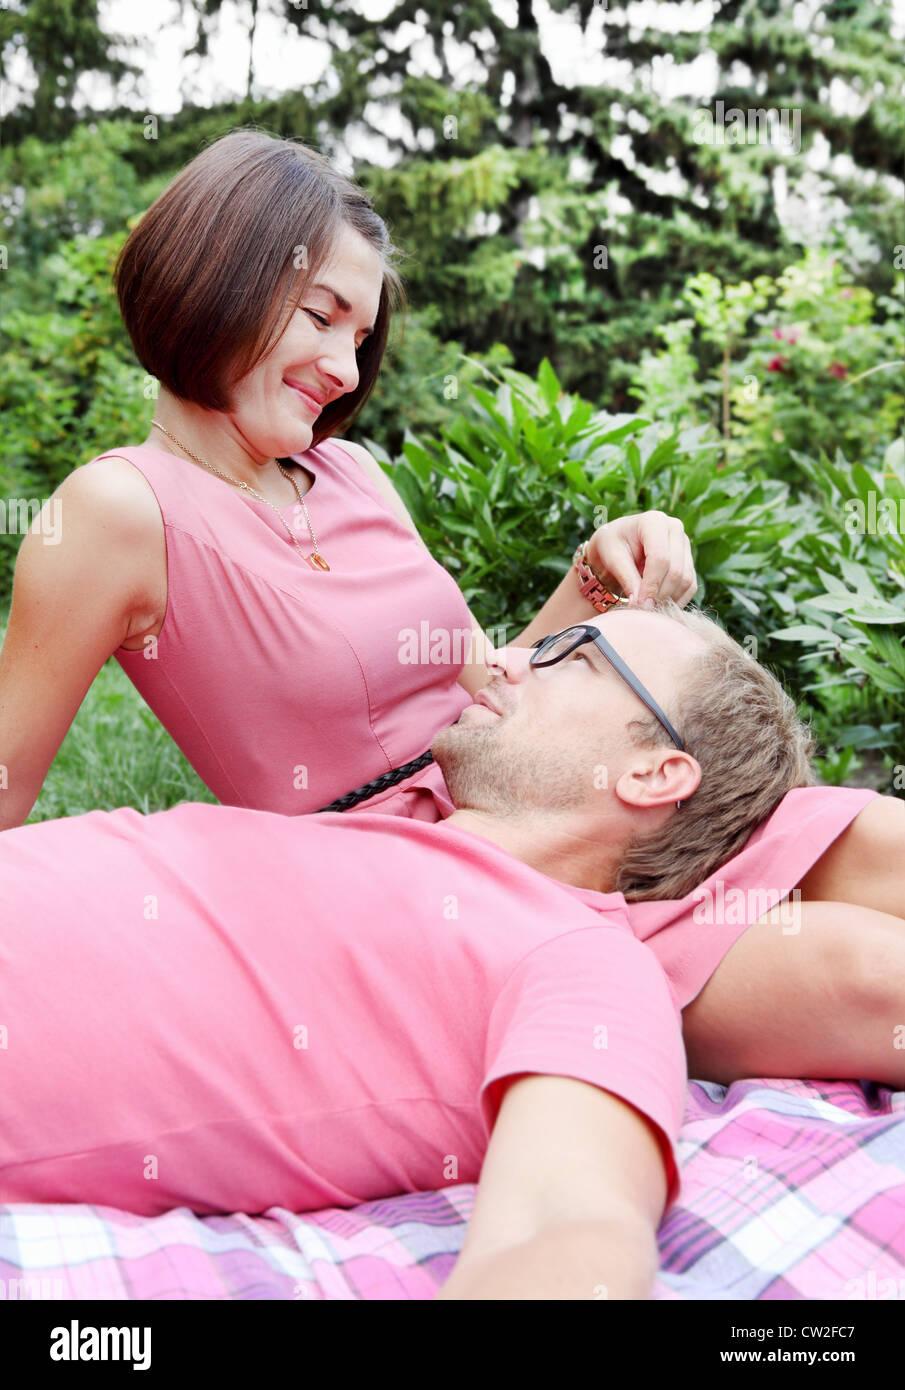 Woman Fondling Man Lovers Sitting on Picnic Stock Photo